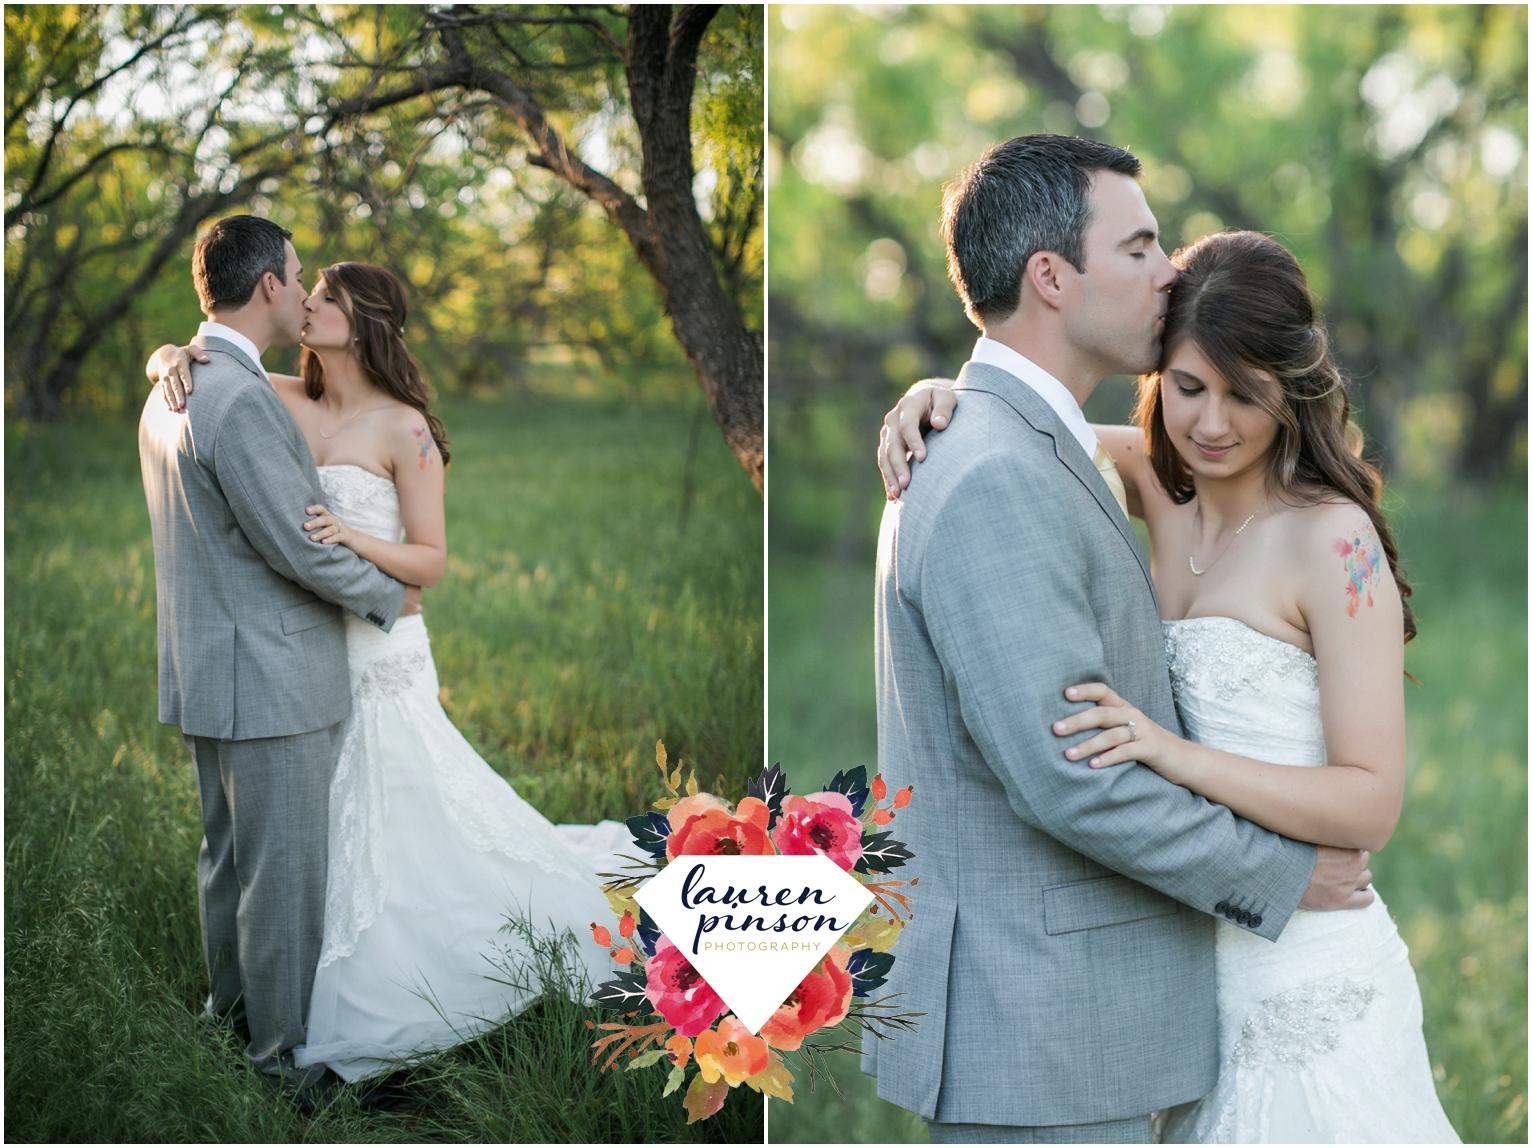 wichita-falls-wedding-photographer-oklahoma-wichita-mountains-bridal-session-bridals-photography_0764.jpg